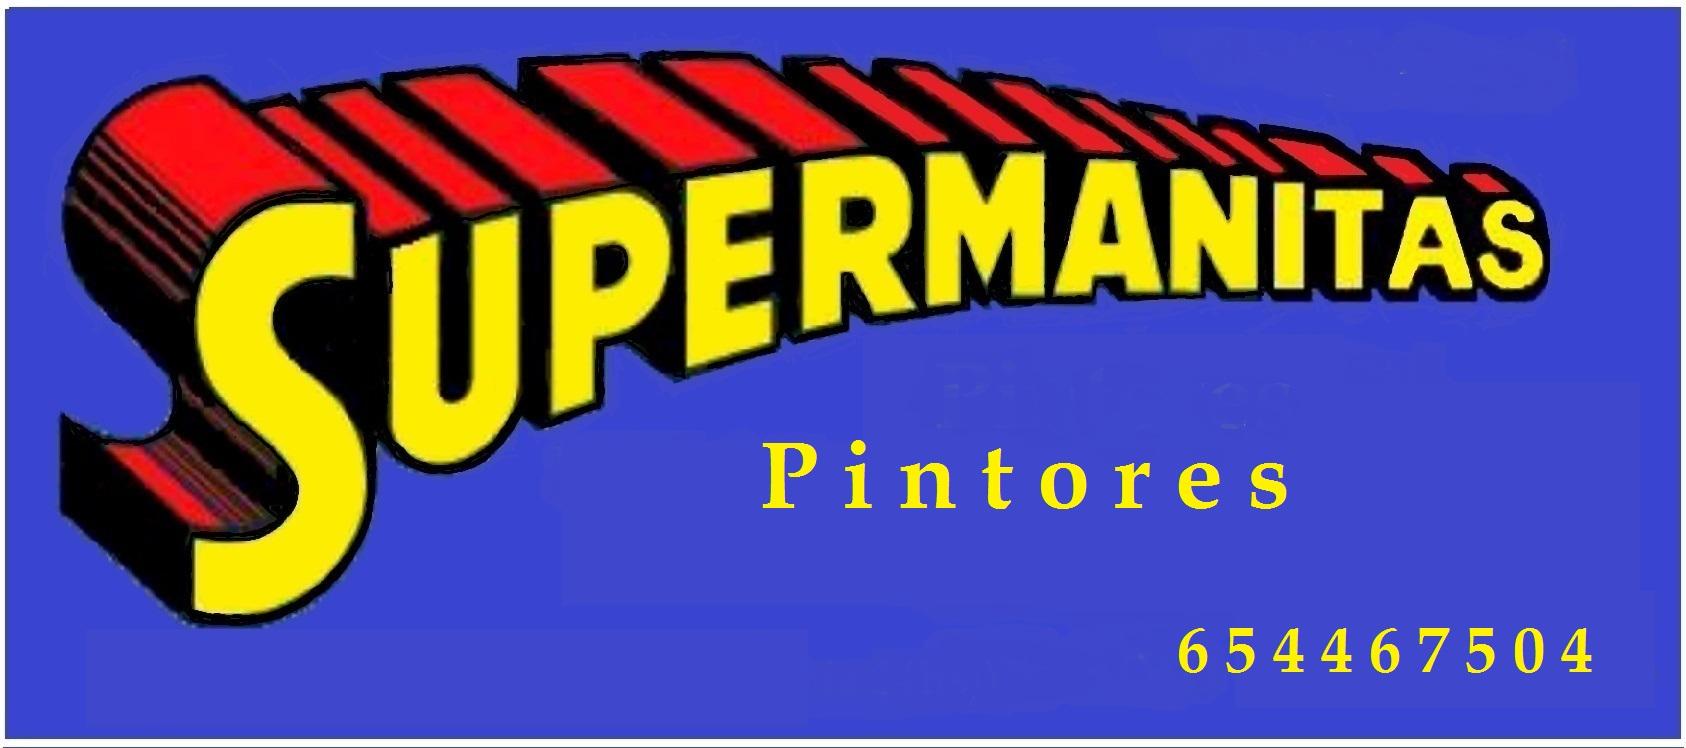 Supermanitas Pintores